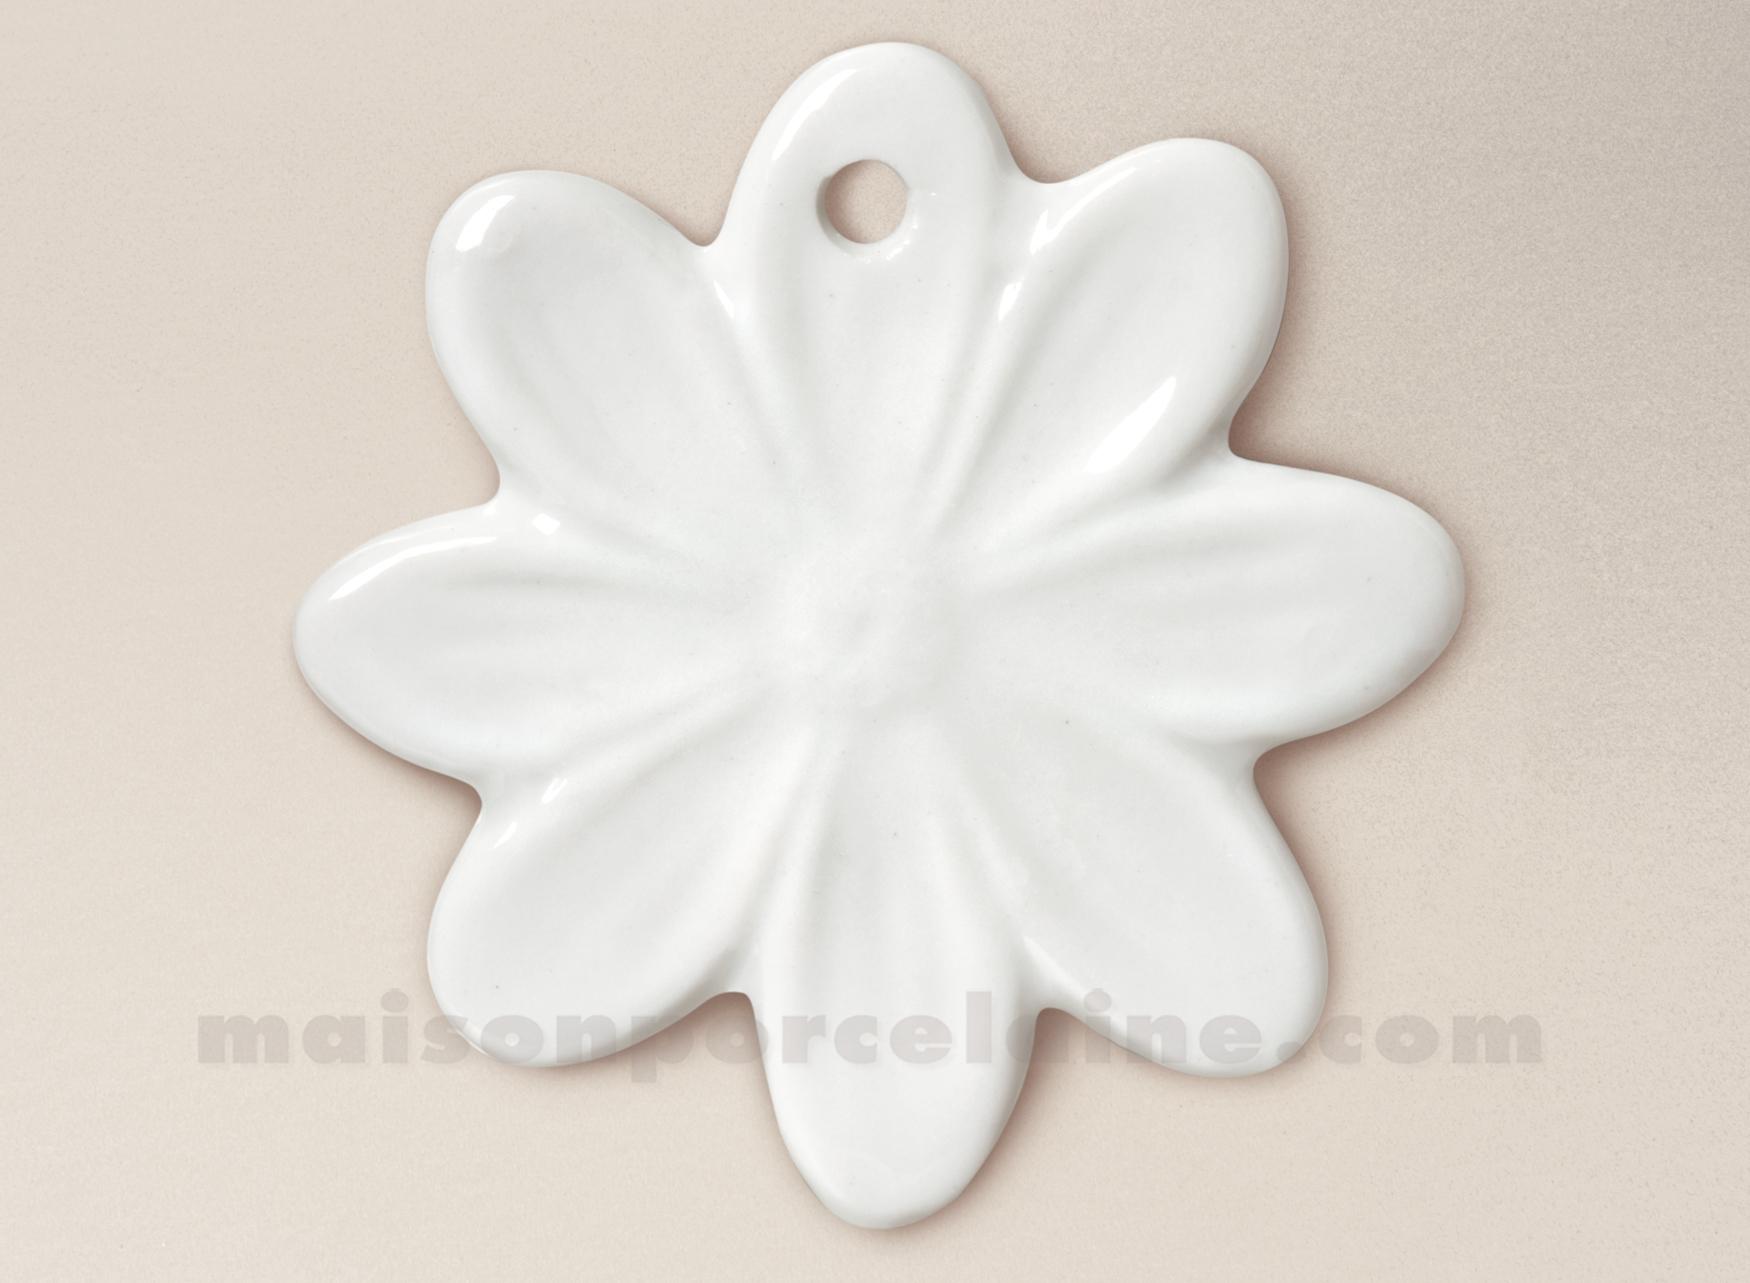 Pendentif medaillon porcelaine blanche a peindre daisy 5x3 maison de la por - La porcelaine blanche ...